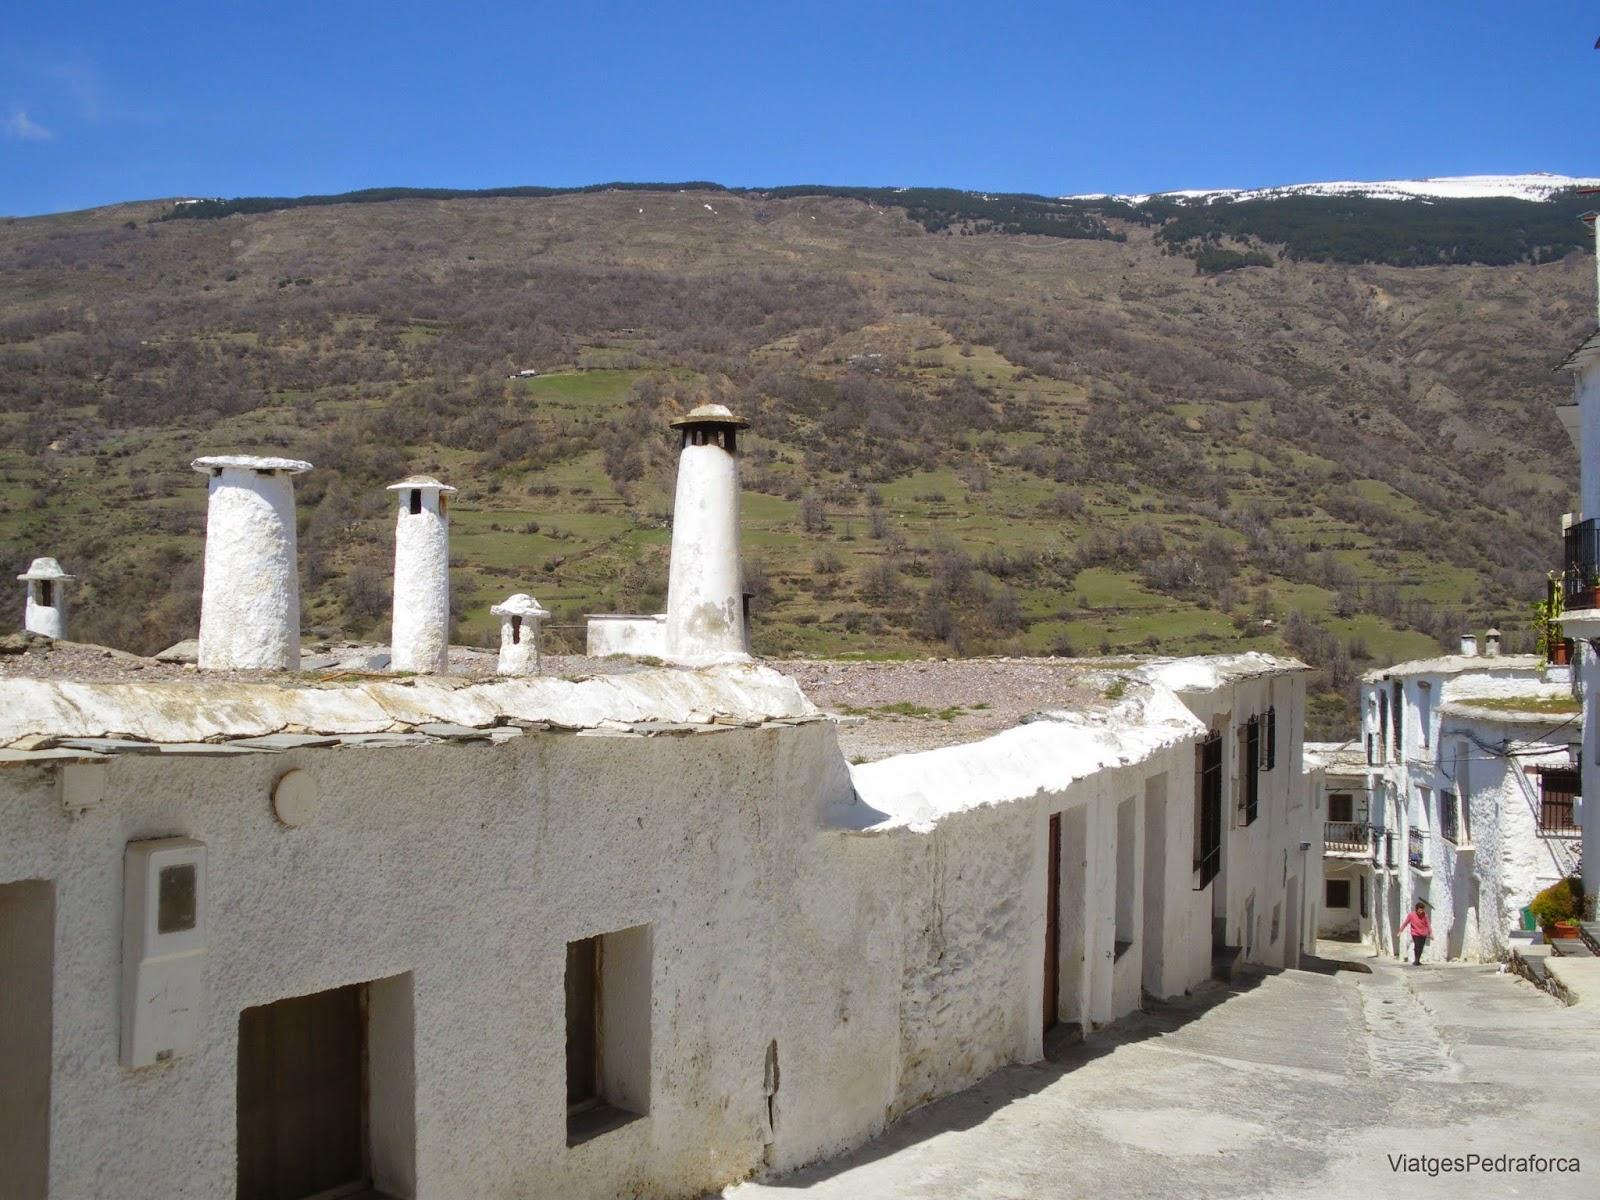 Alpujarra Granadina Terrao Sierra Nevada Barranco del Poqueira Andalucia